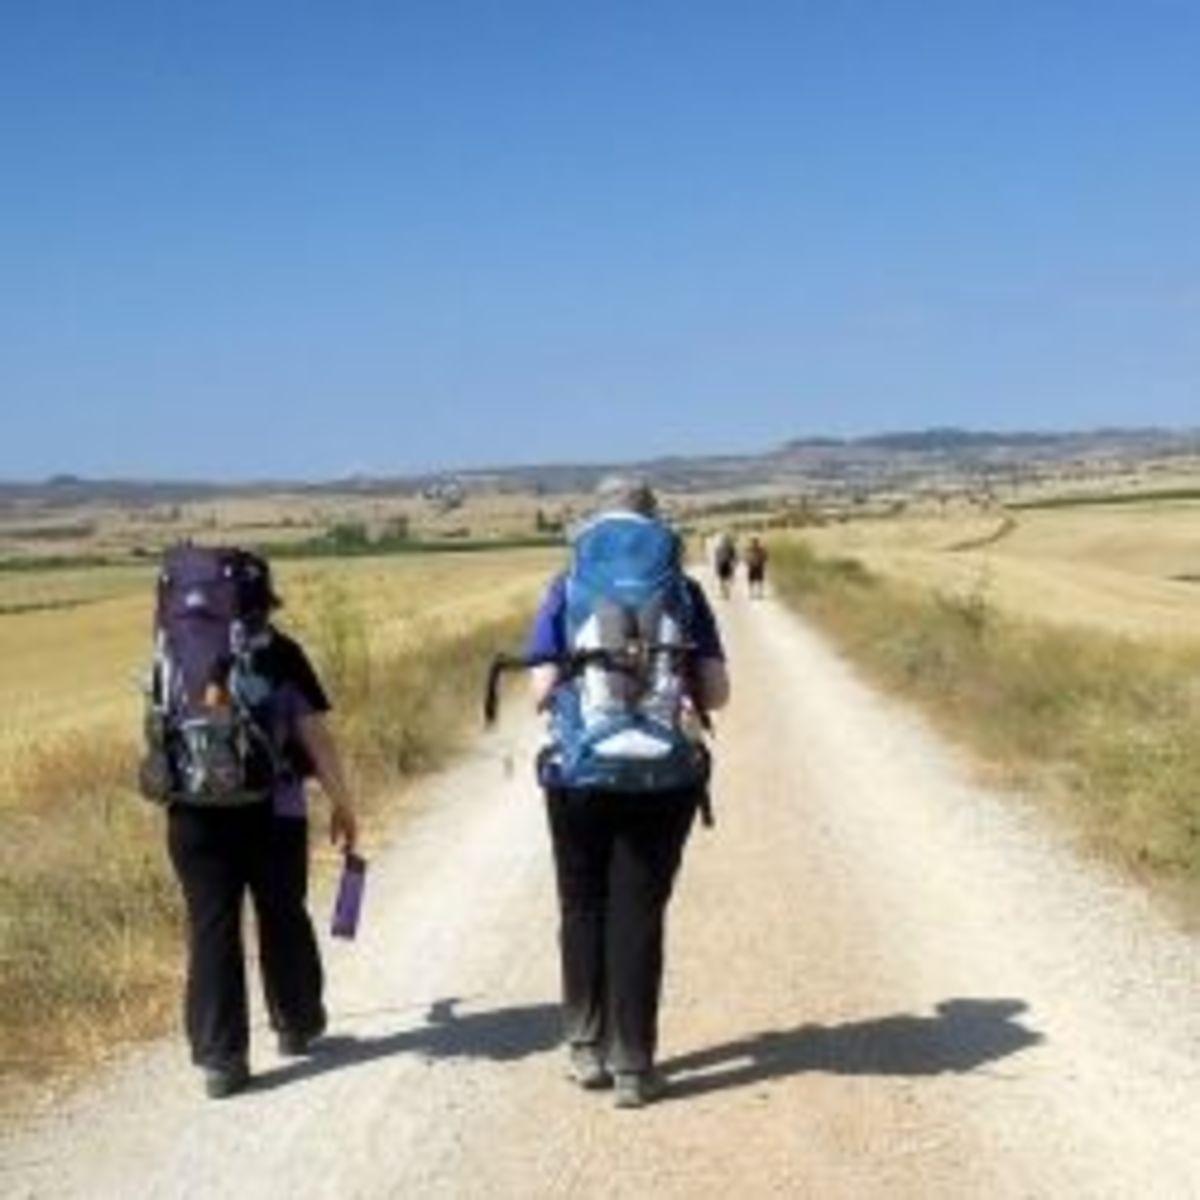 Camino de Santiago, pilgrim